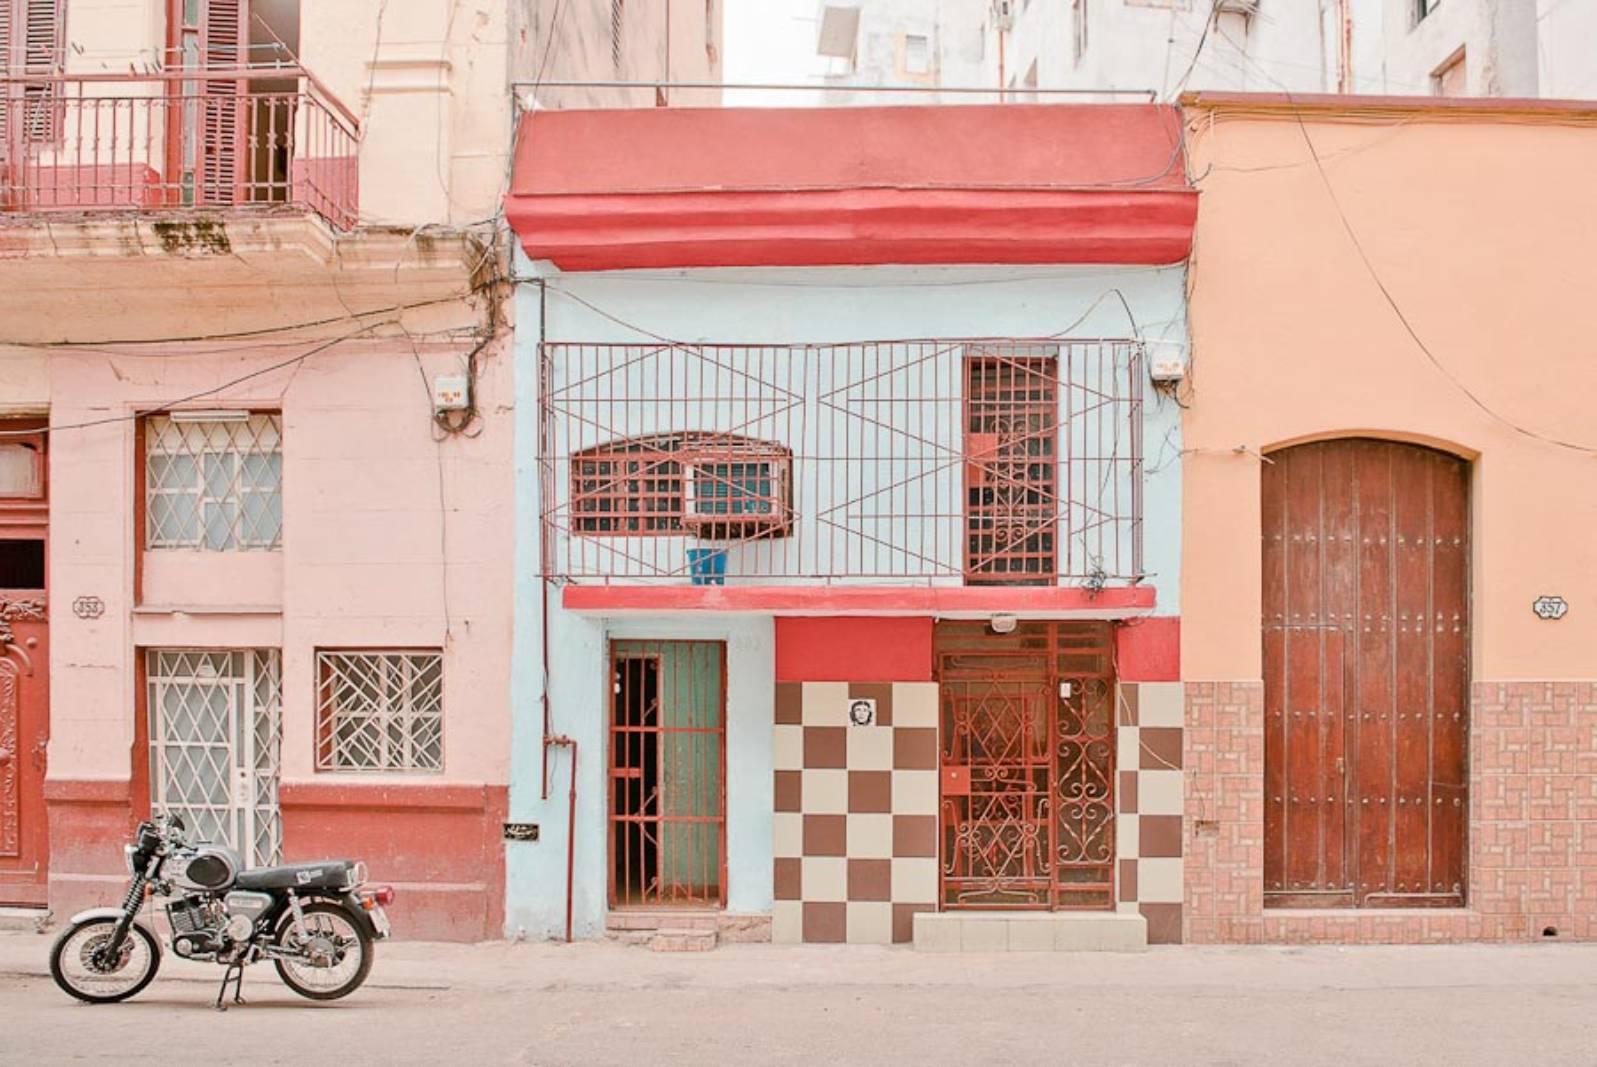 La Havane, Cuba ©️ Helene Havard